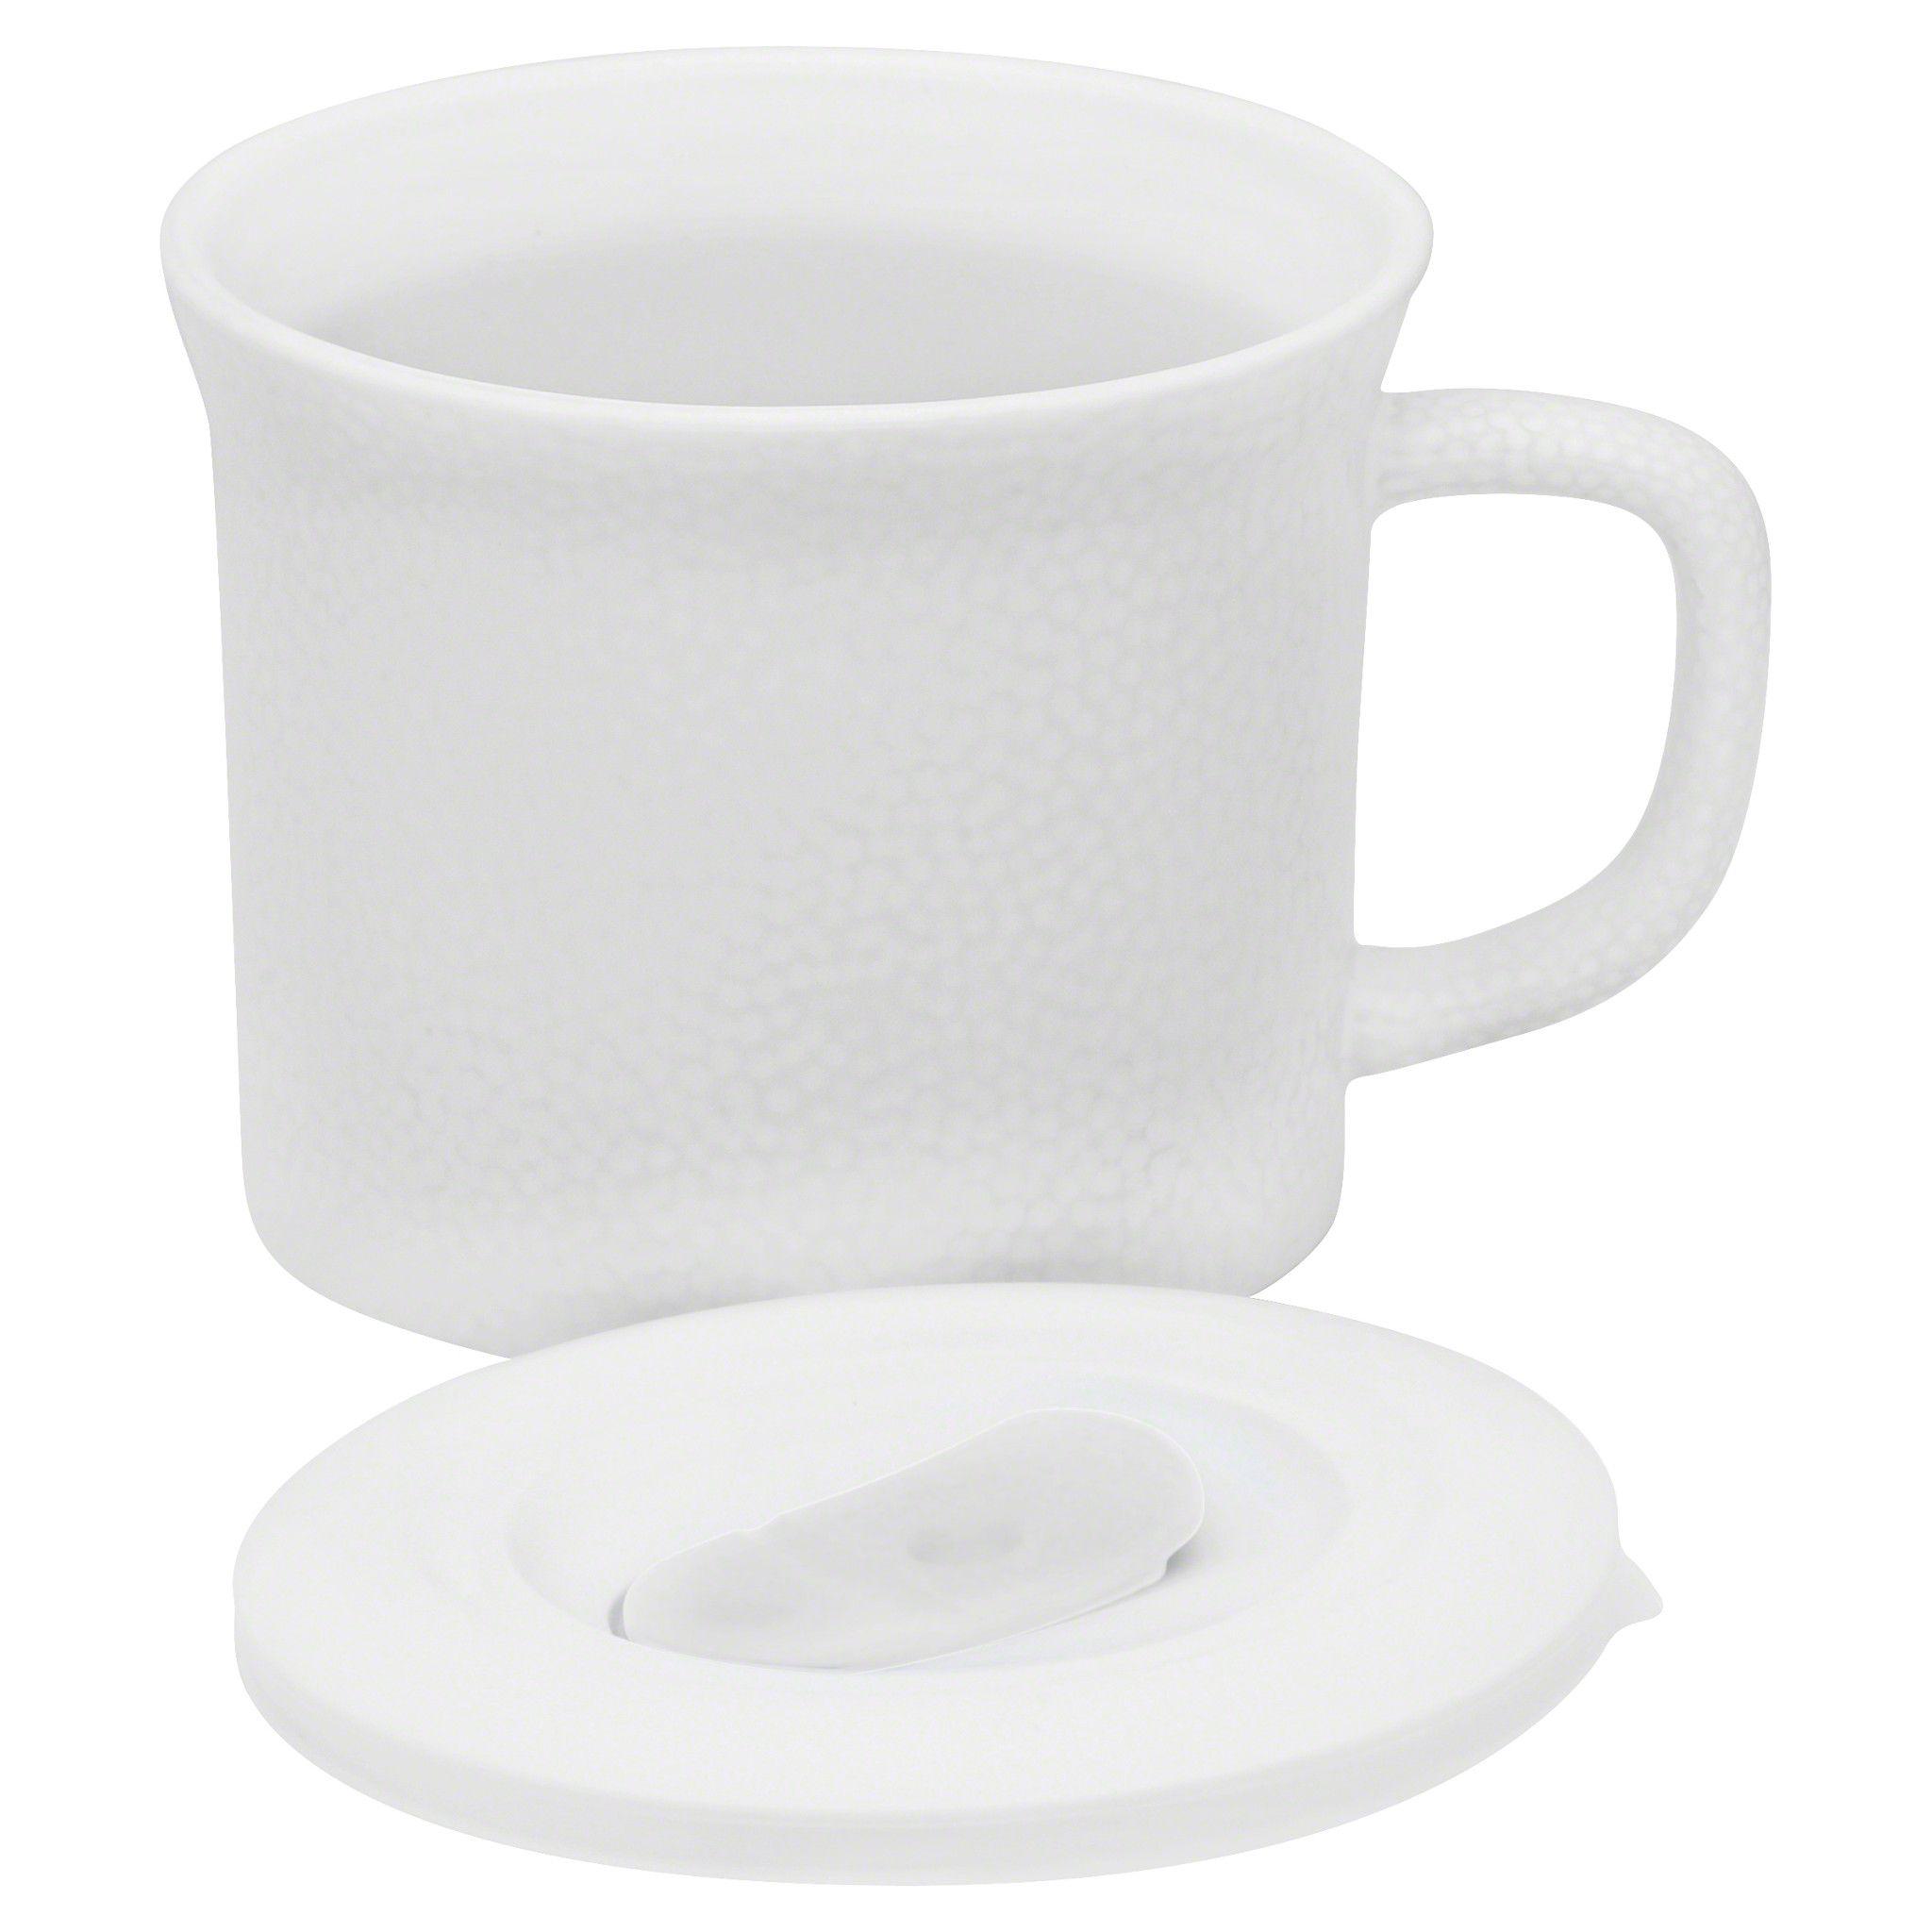 Corningware 20-Oz Hammered Powder Meal Mug W/ Vented Lid